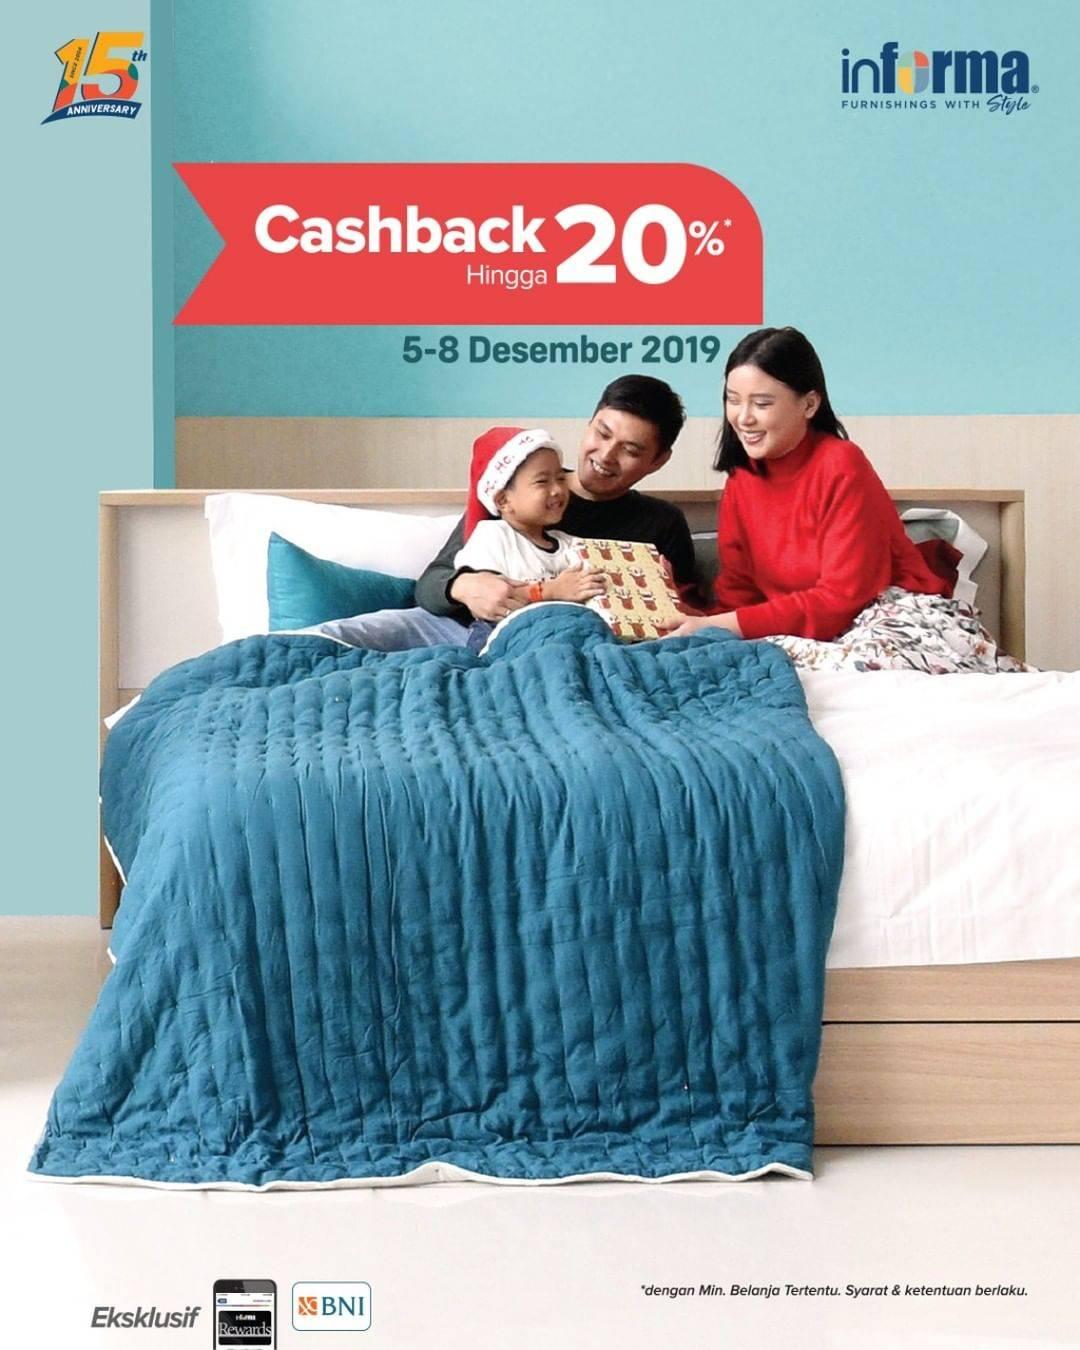 Informa Promo Cashback 20% Untuk Produk Furnitur